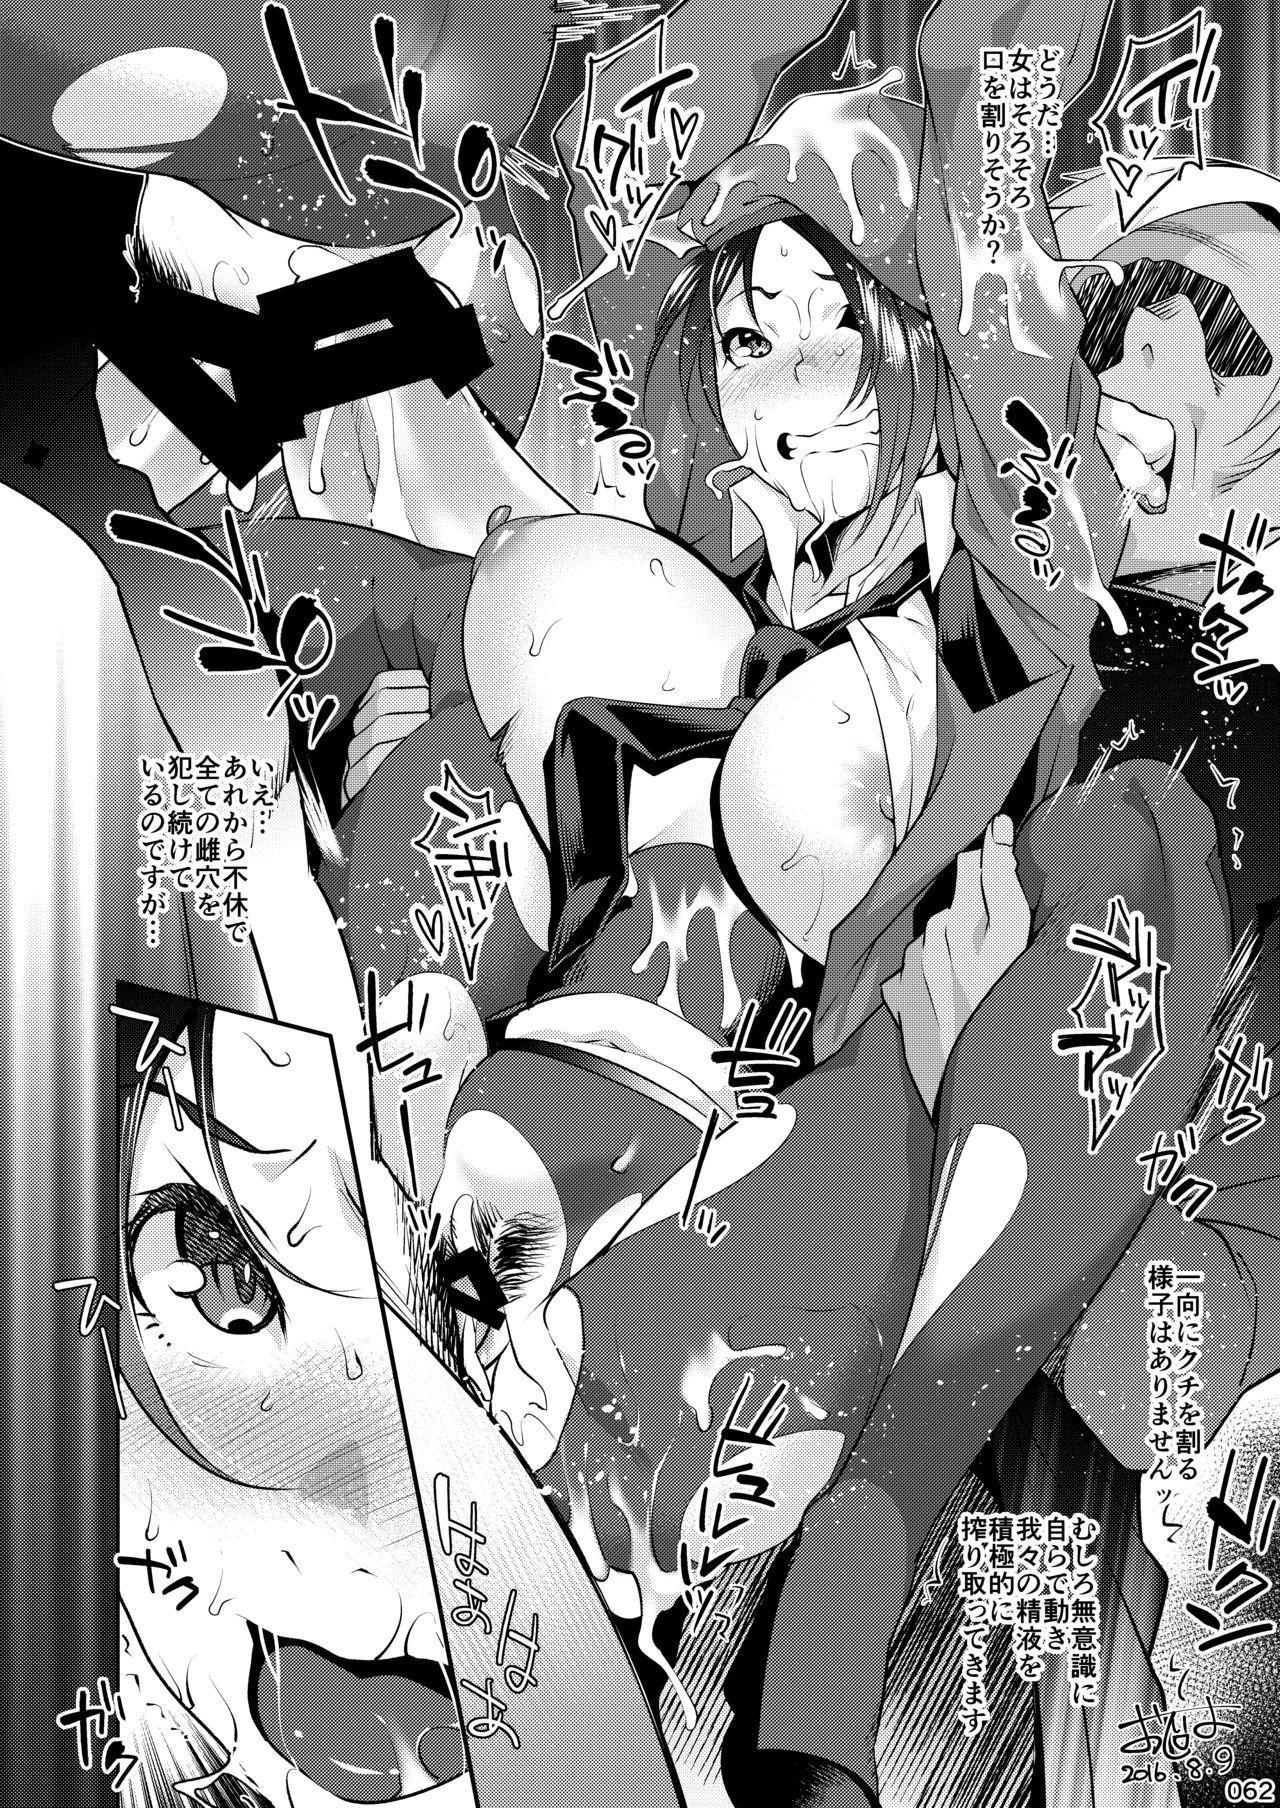 Akatsuki Blitzkampf & EN-1 Perfekt Welt Gangbang Anthology 61